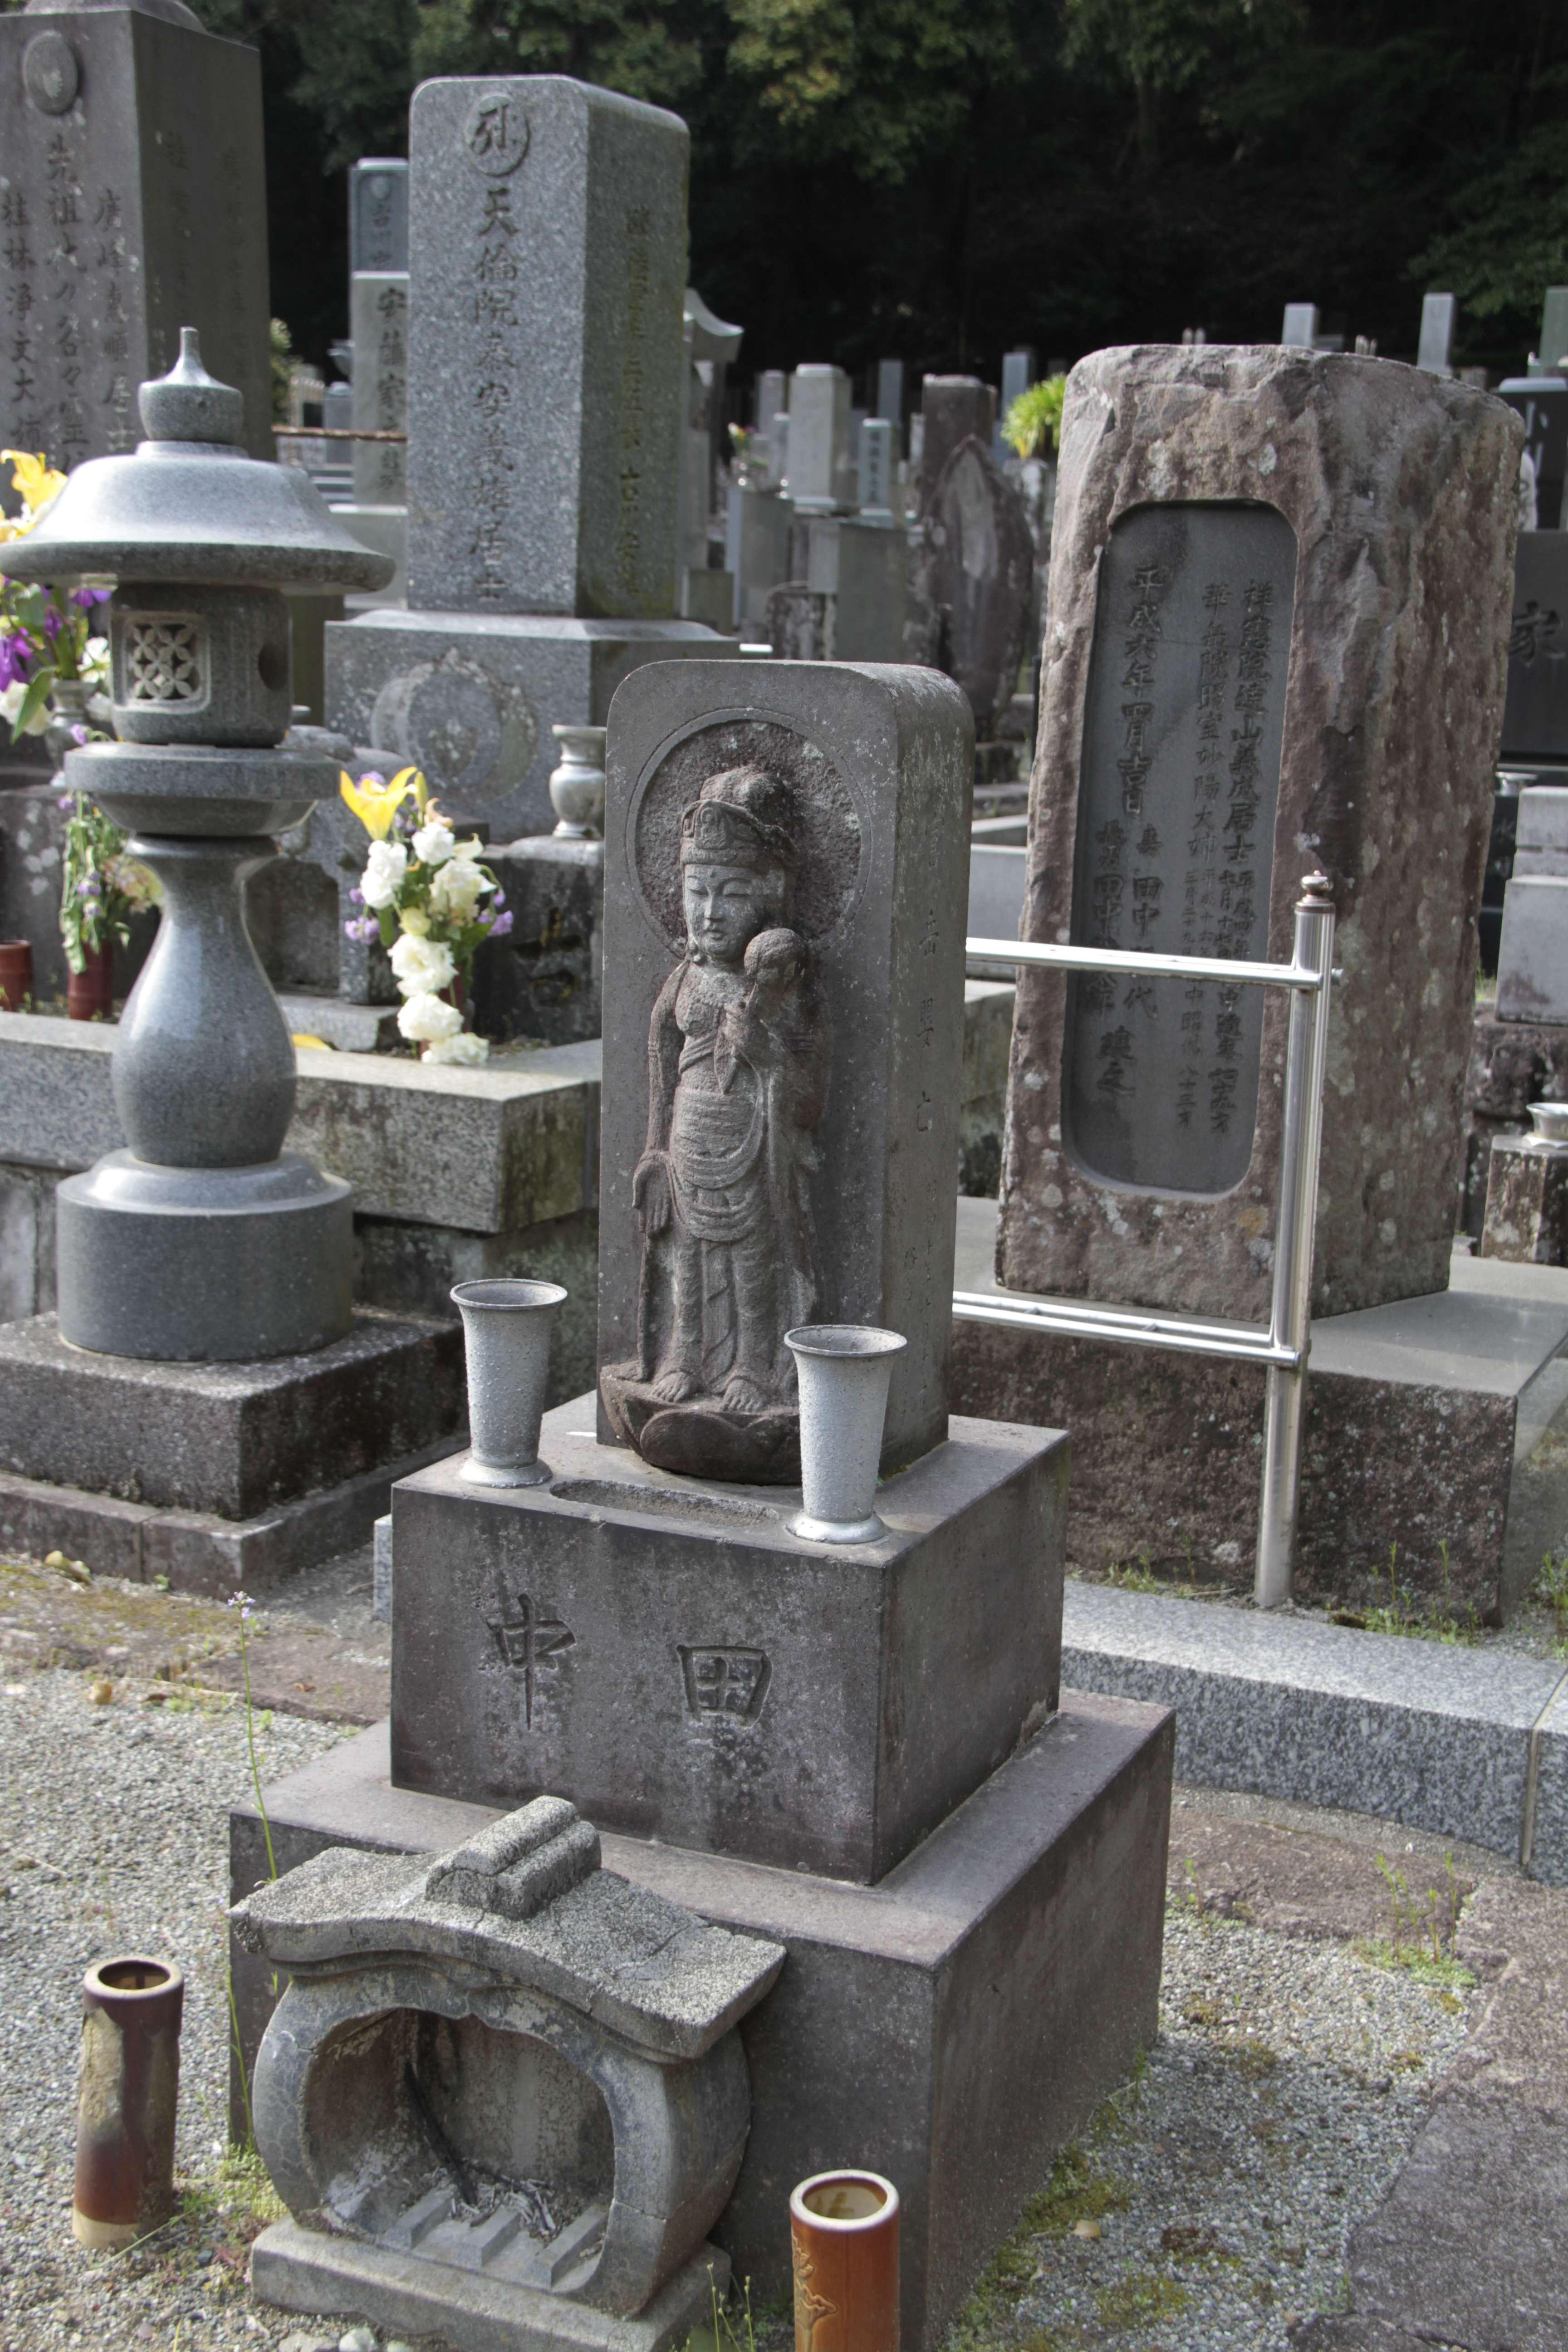 Japon avril 2017_0287 Hakone Yumoto sanctuaire bouddhiste Soun ji